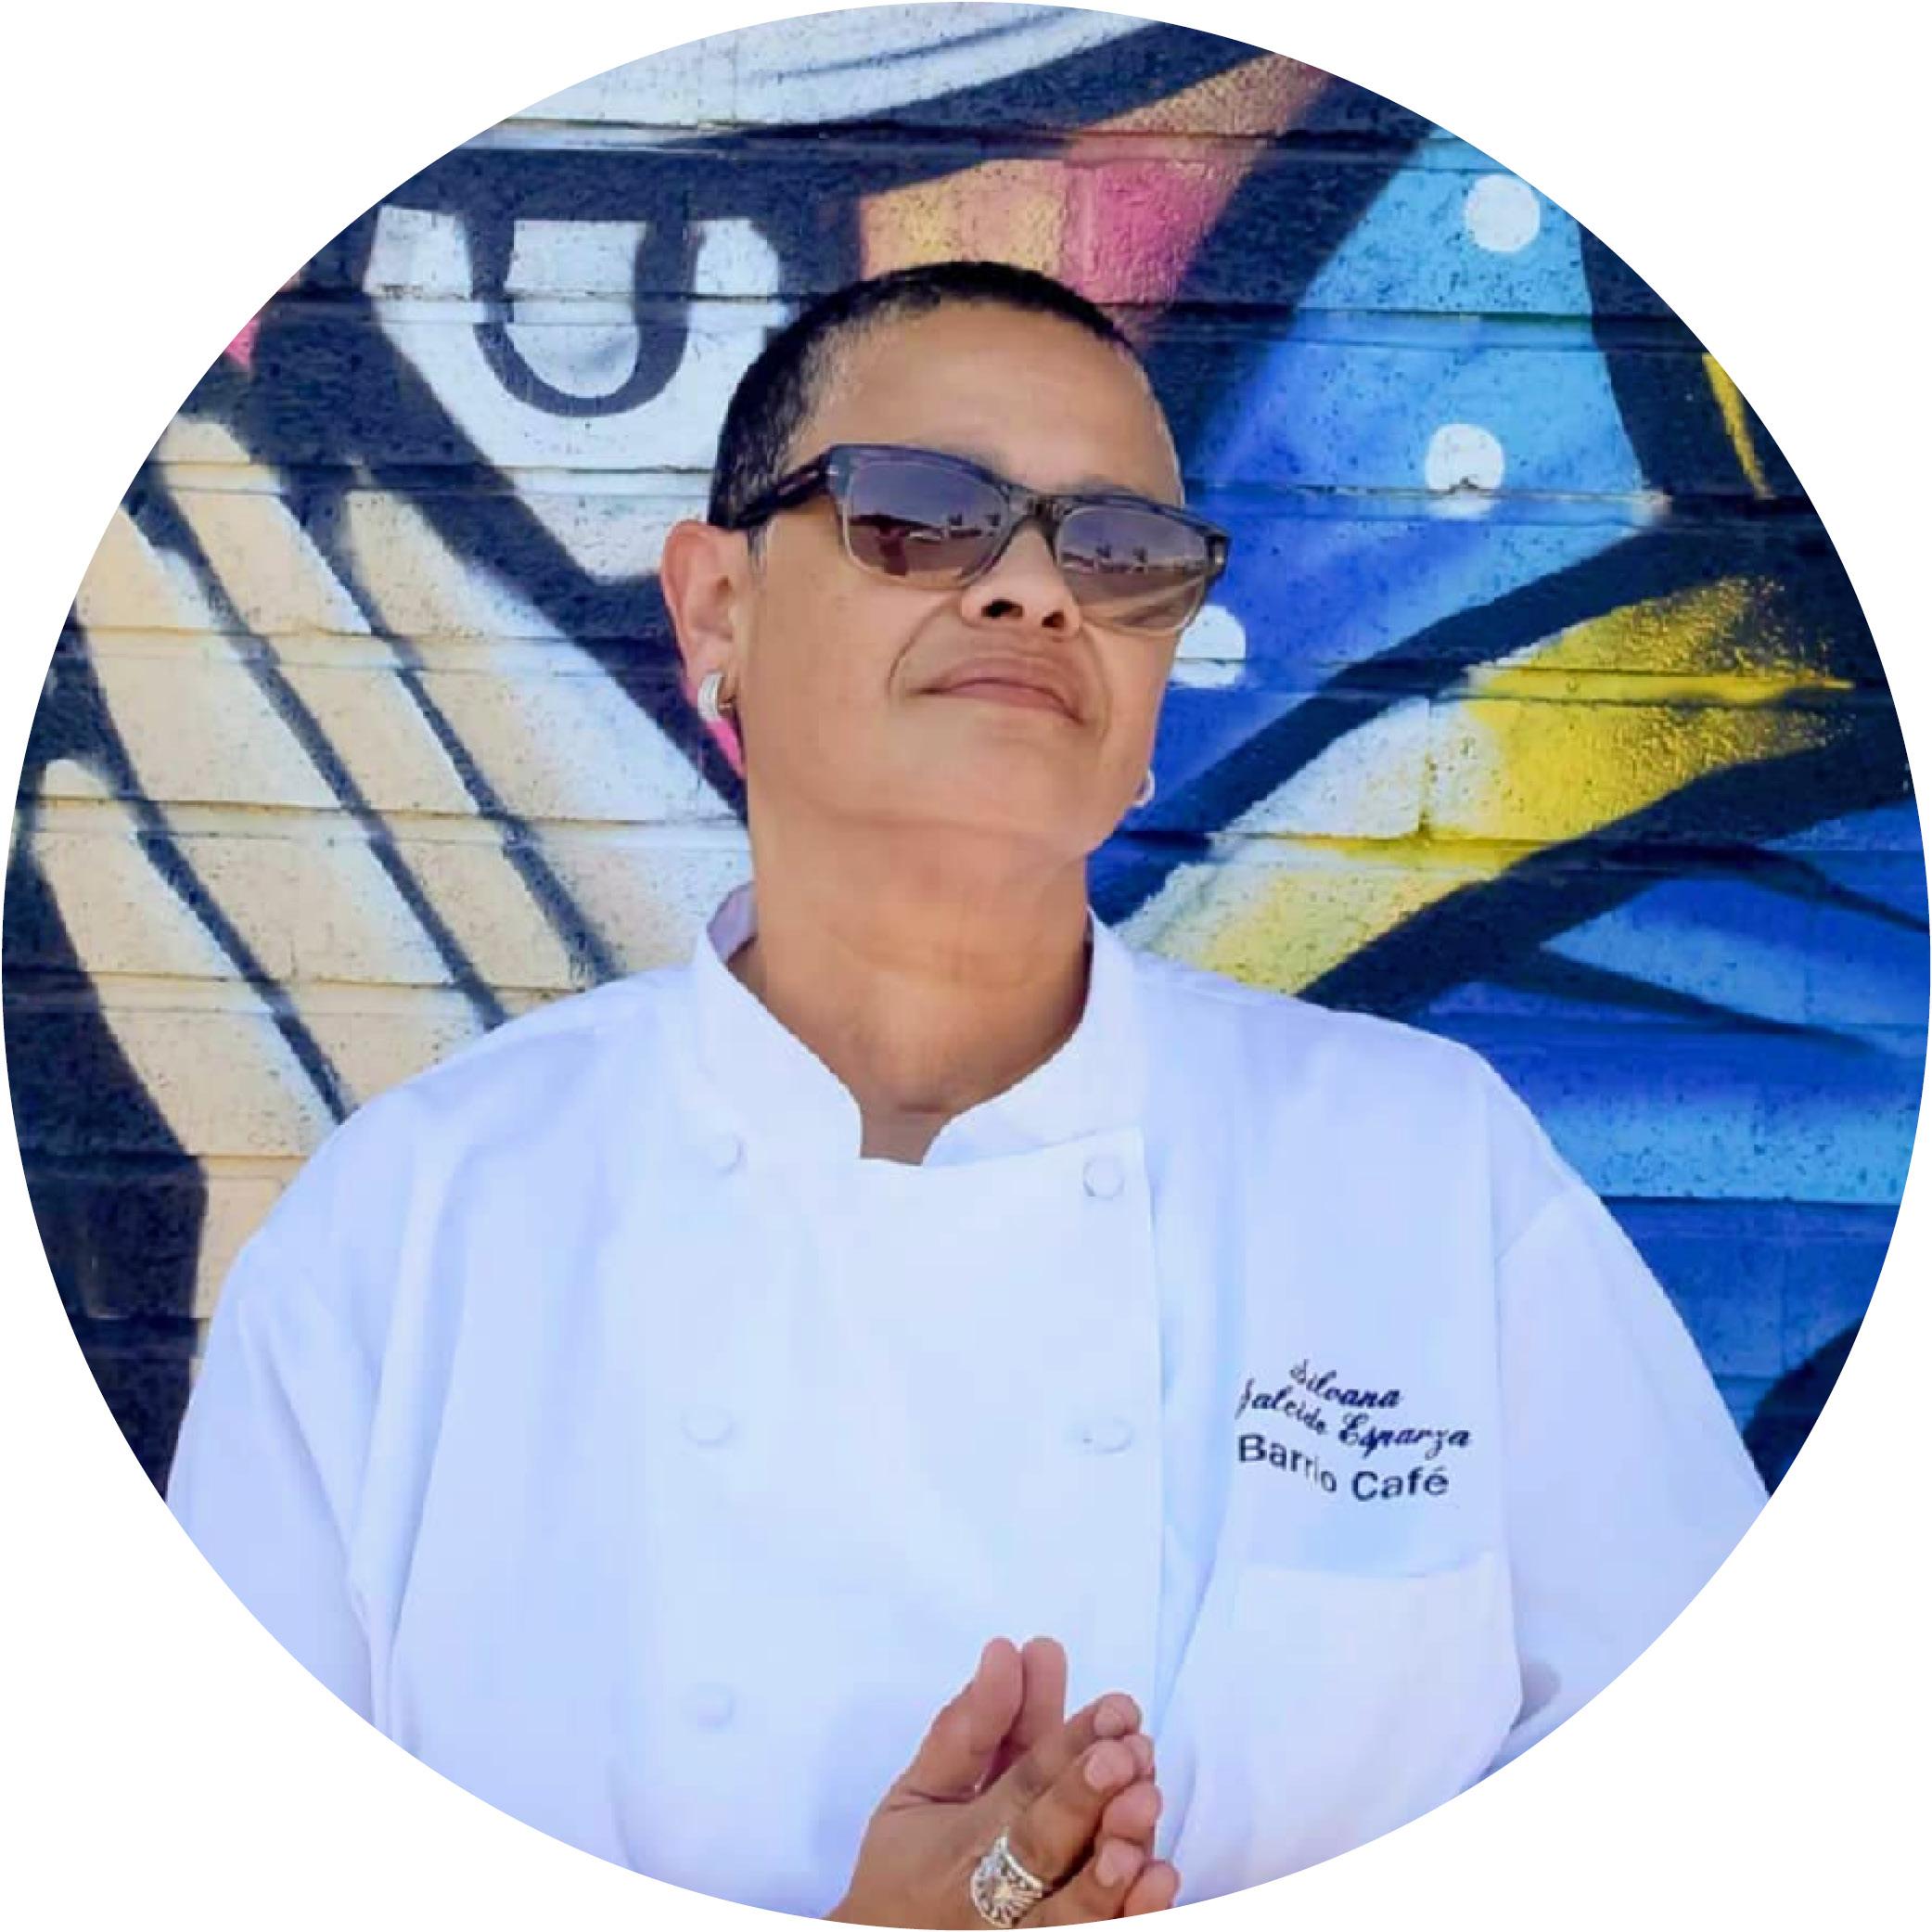 DevourPhoenix-2019-ChefHeadshots-Chefs4.jpg